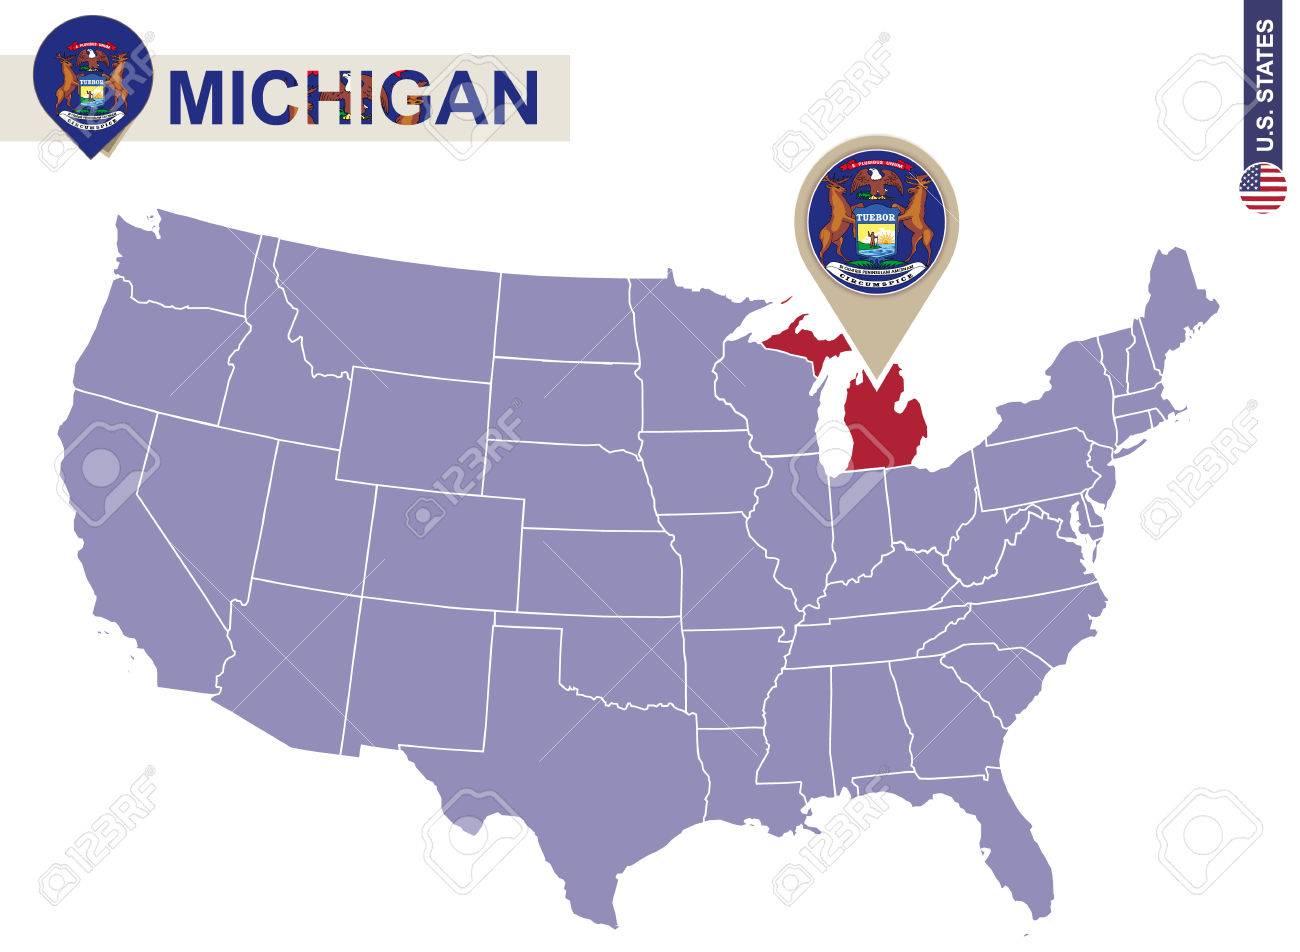 Michigan State On USA Map Michigan Flag And Map US States - Usa map michigan state